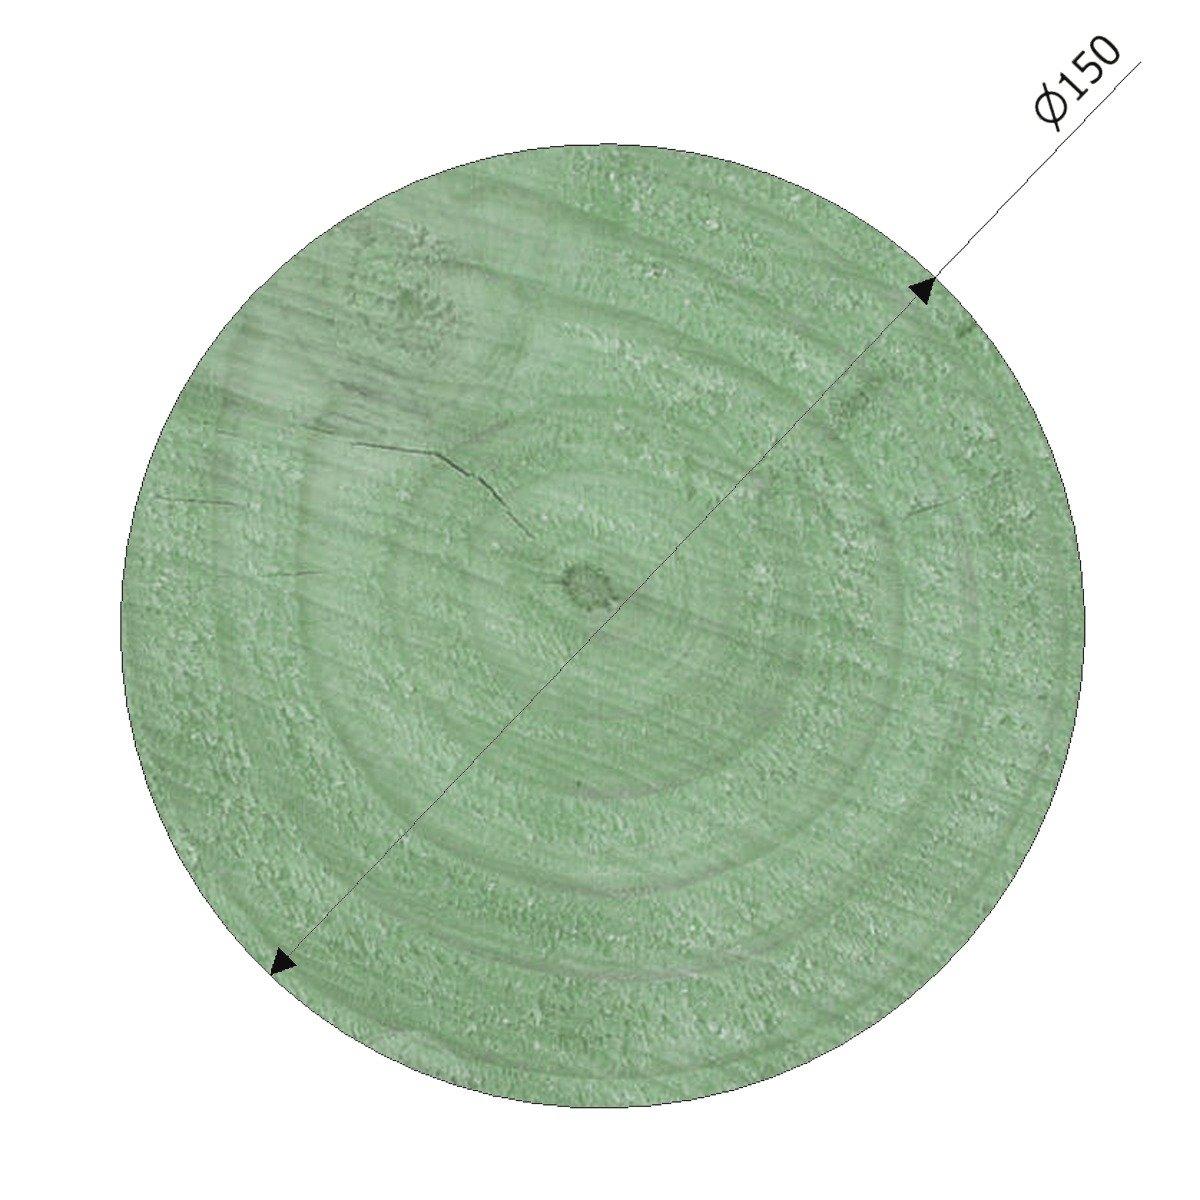 150mm Diameter Pressure Treated Radiata Pine Poles Suitable For Building And Maintaining Playground Equipment